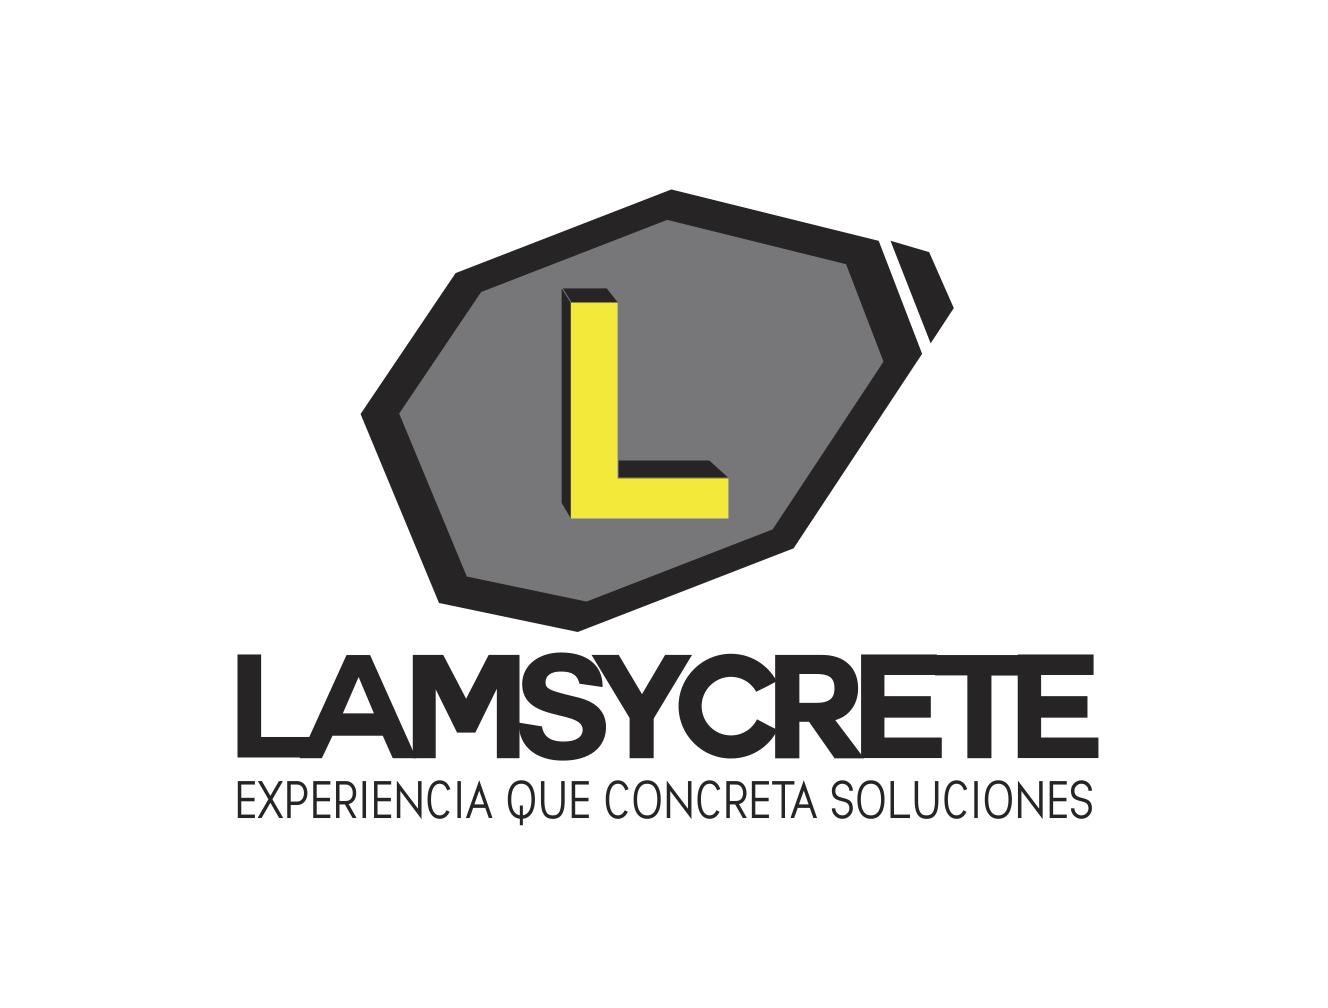 15 LAMSYCRETE.png